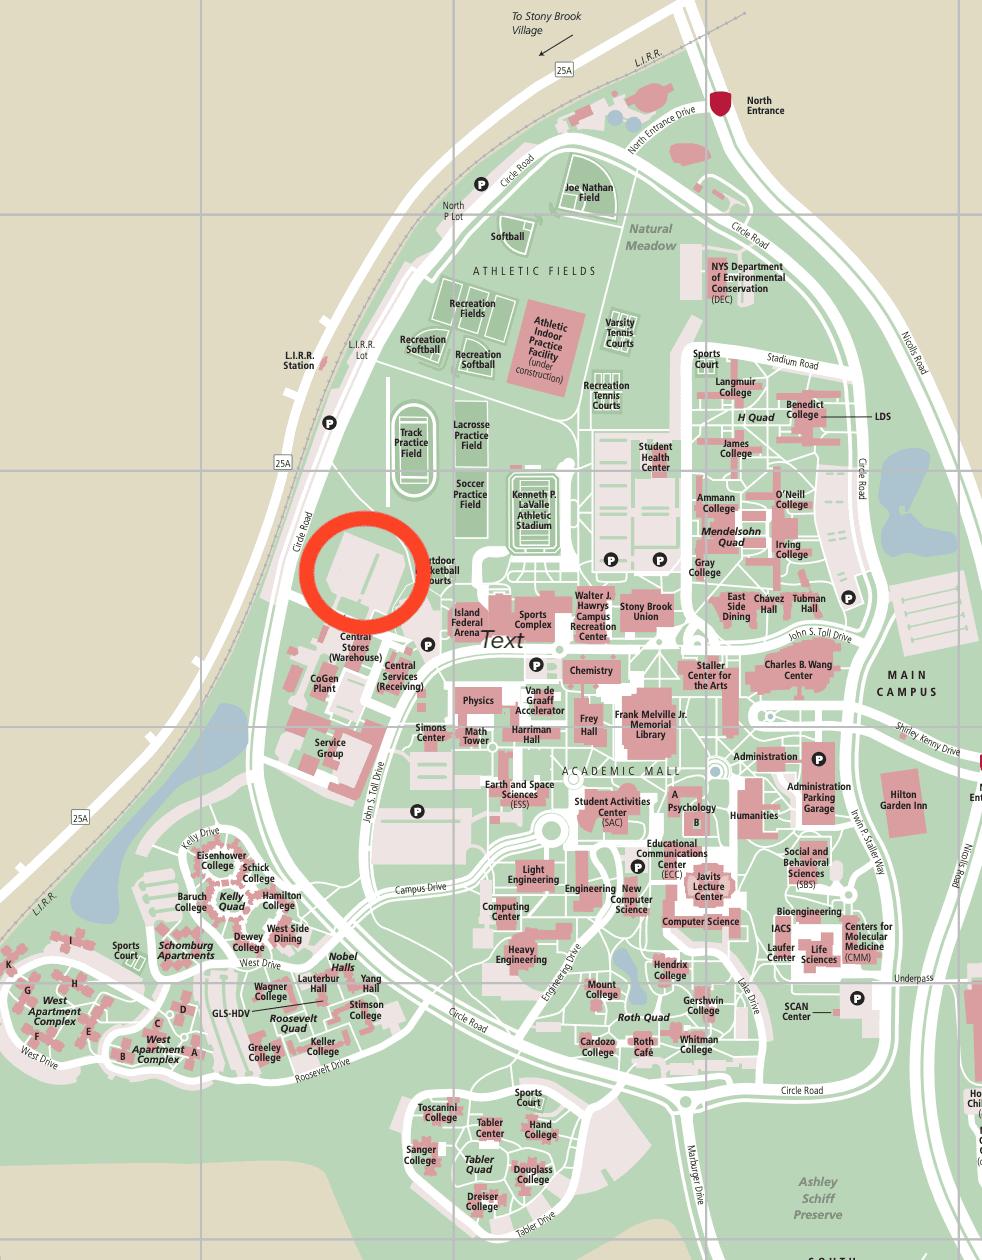 Stony Brook Campus Map gym road map pc stony brook university – The Statesman